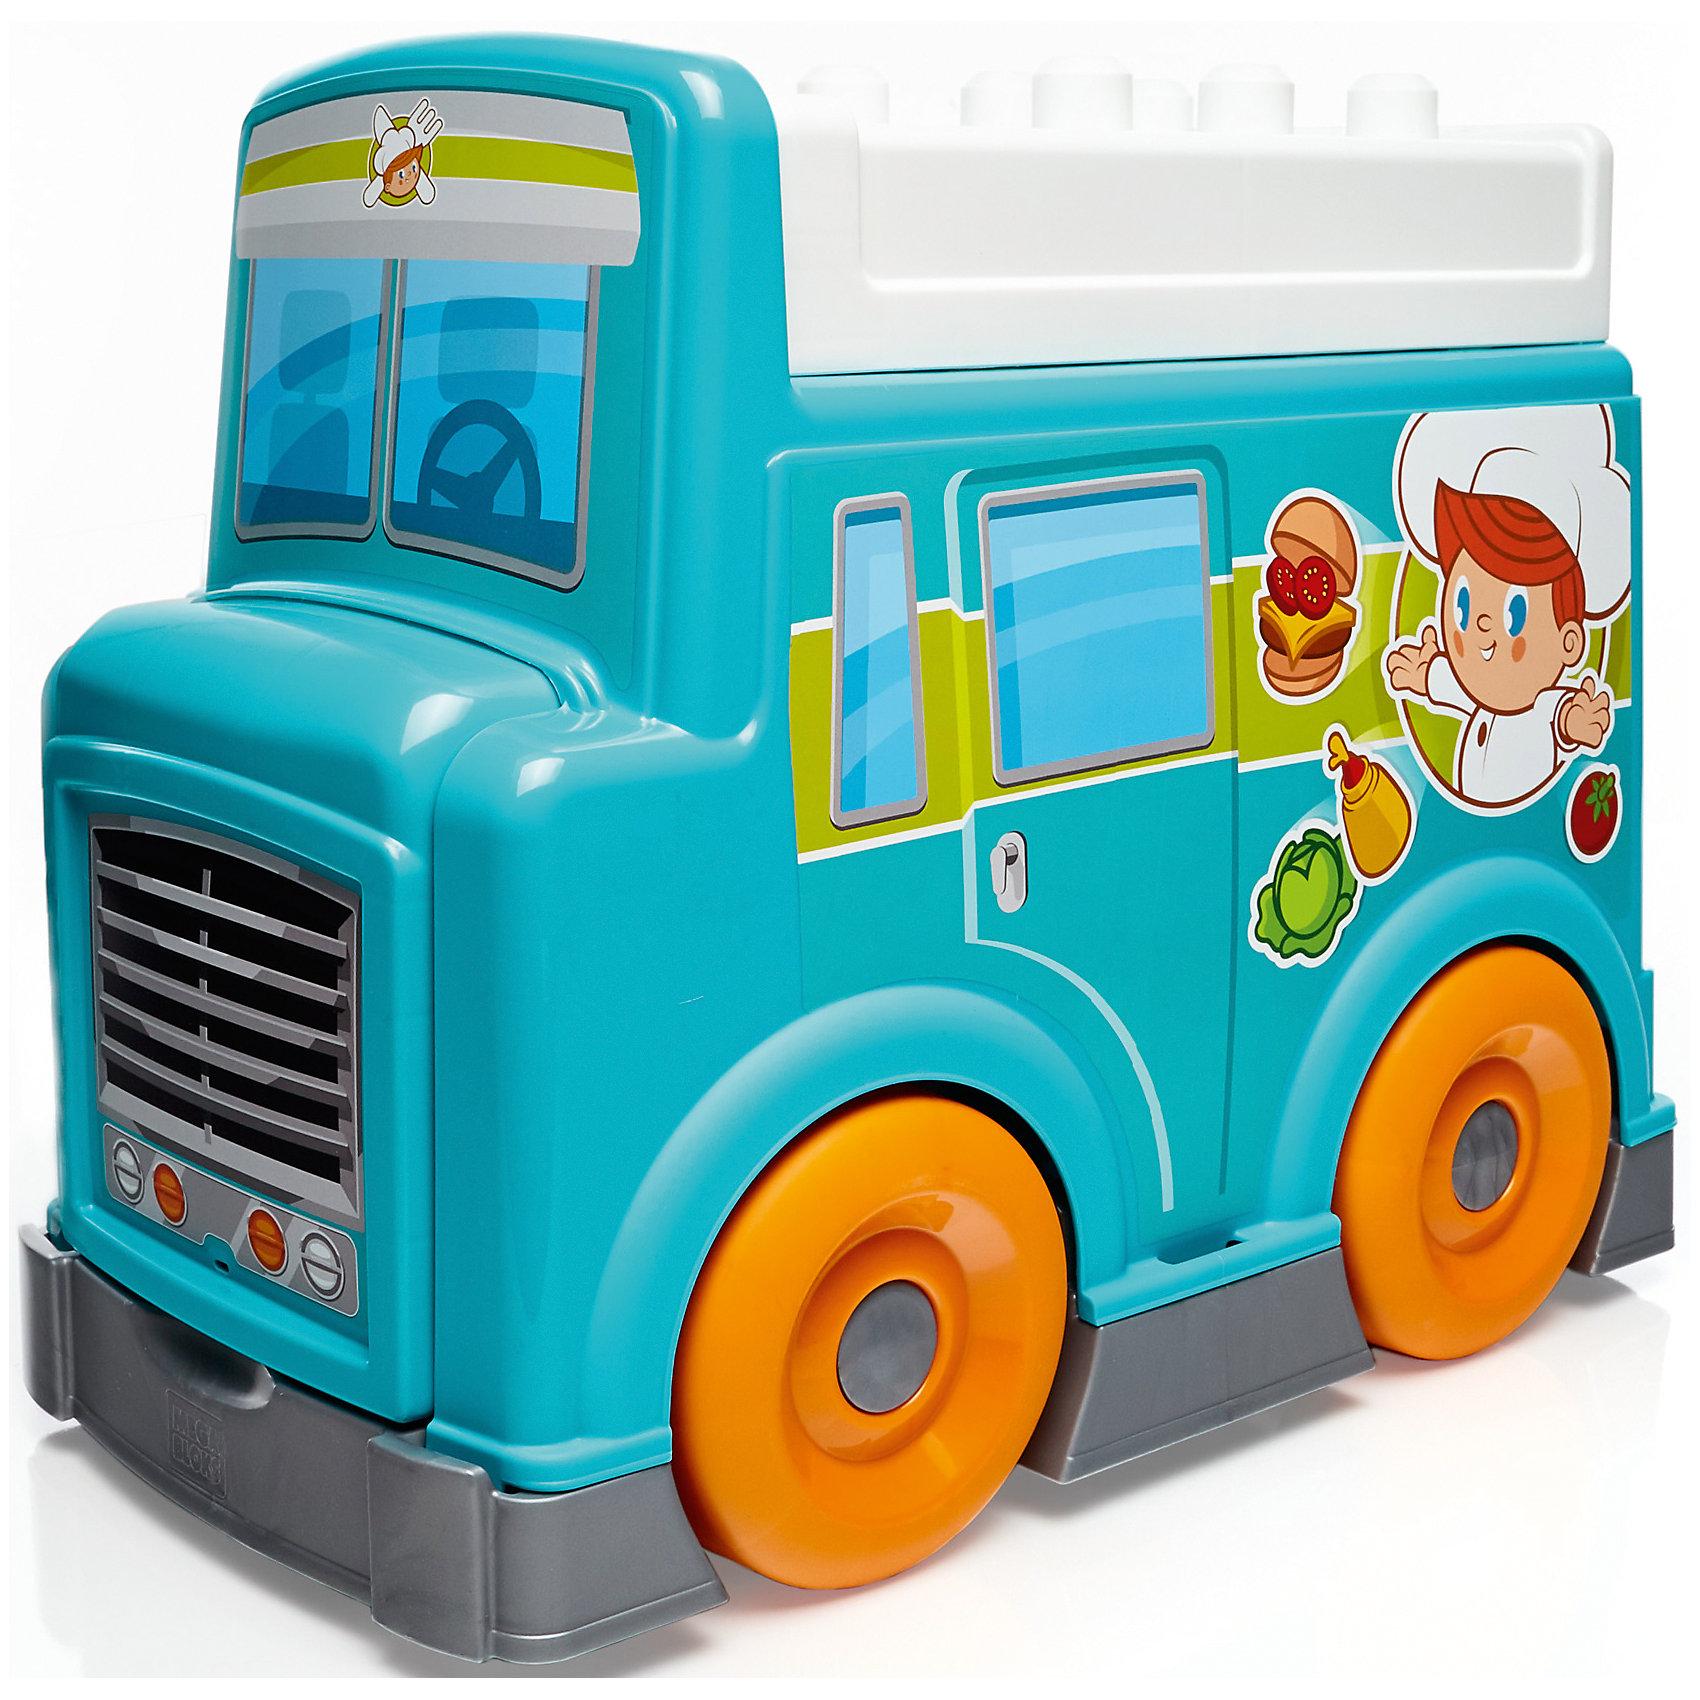 MEGA BLOKS Игровой набор Продуктовый фургон, MEGA BLOKS mega bloks mega bloks грузовик трансформер